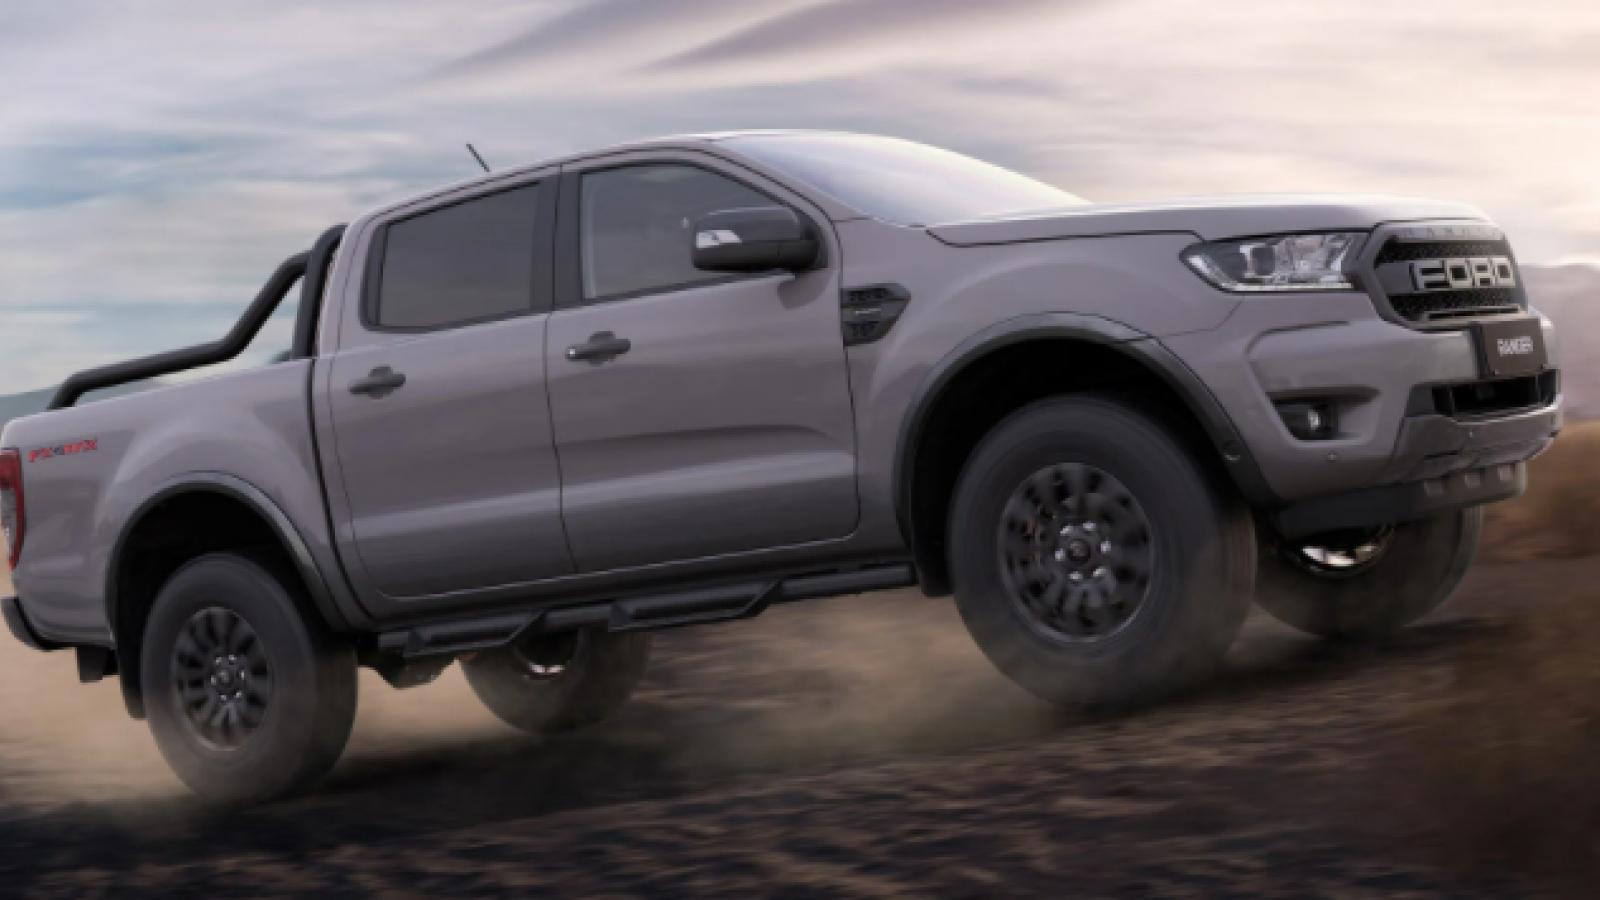 Ford Ranger FX4 MAX lấy cảm hứng từ Raptor tại Australia